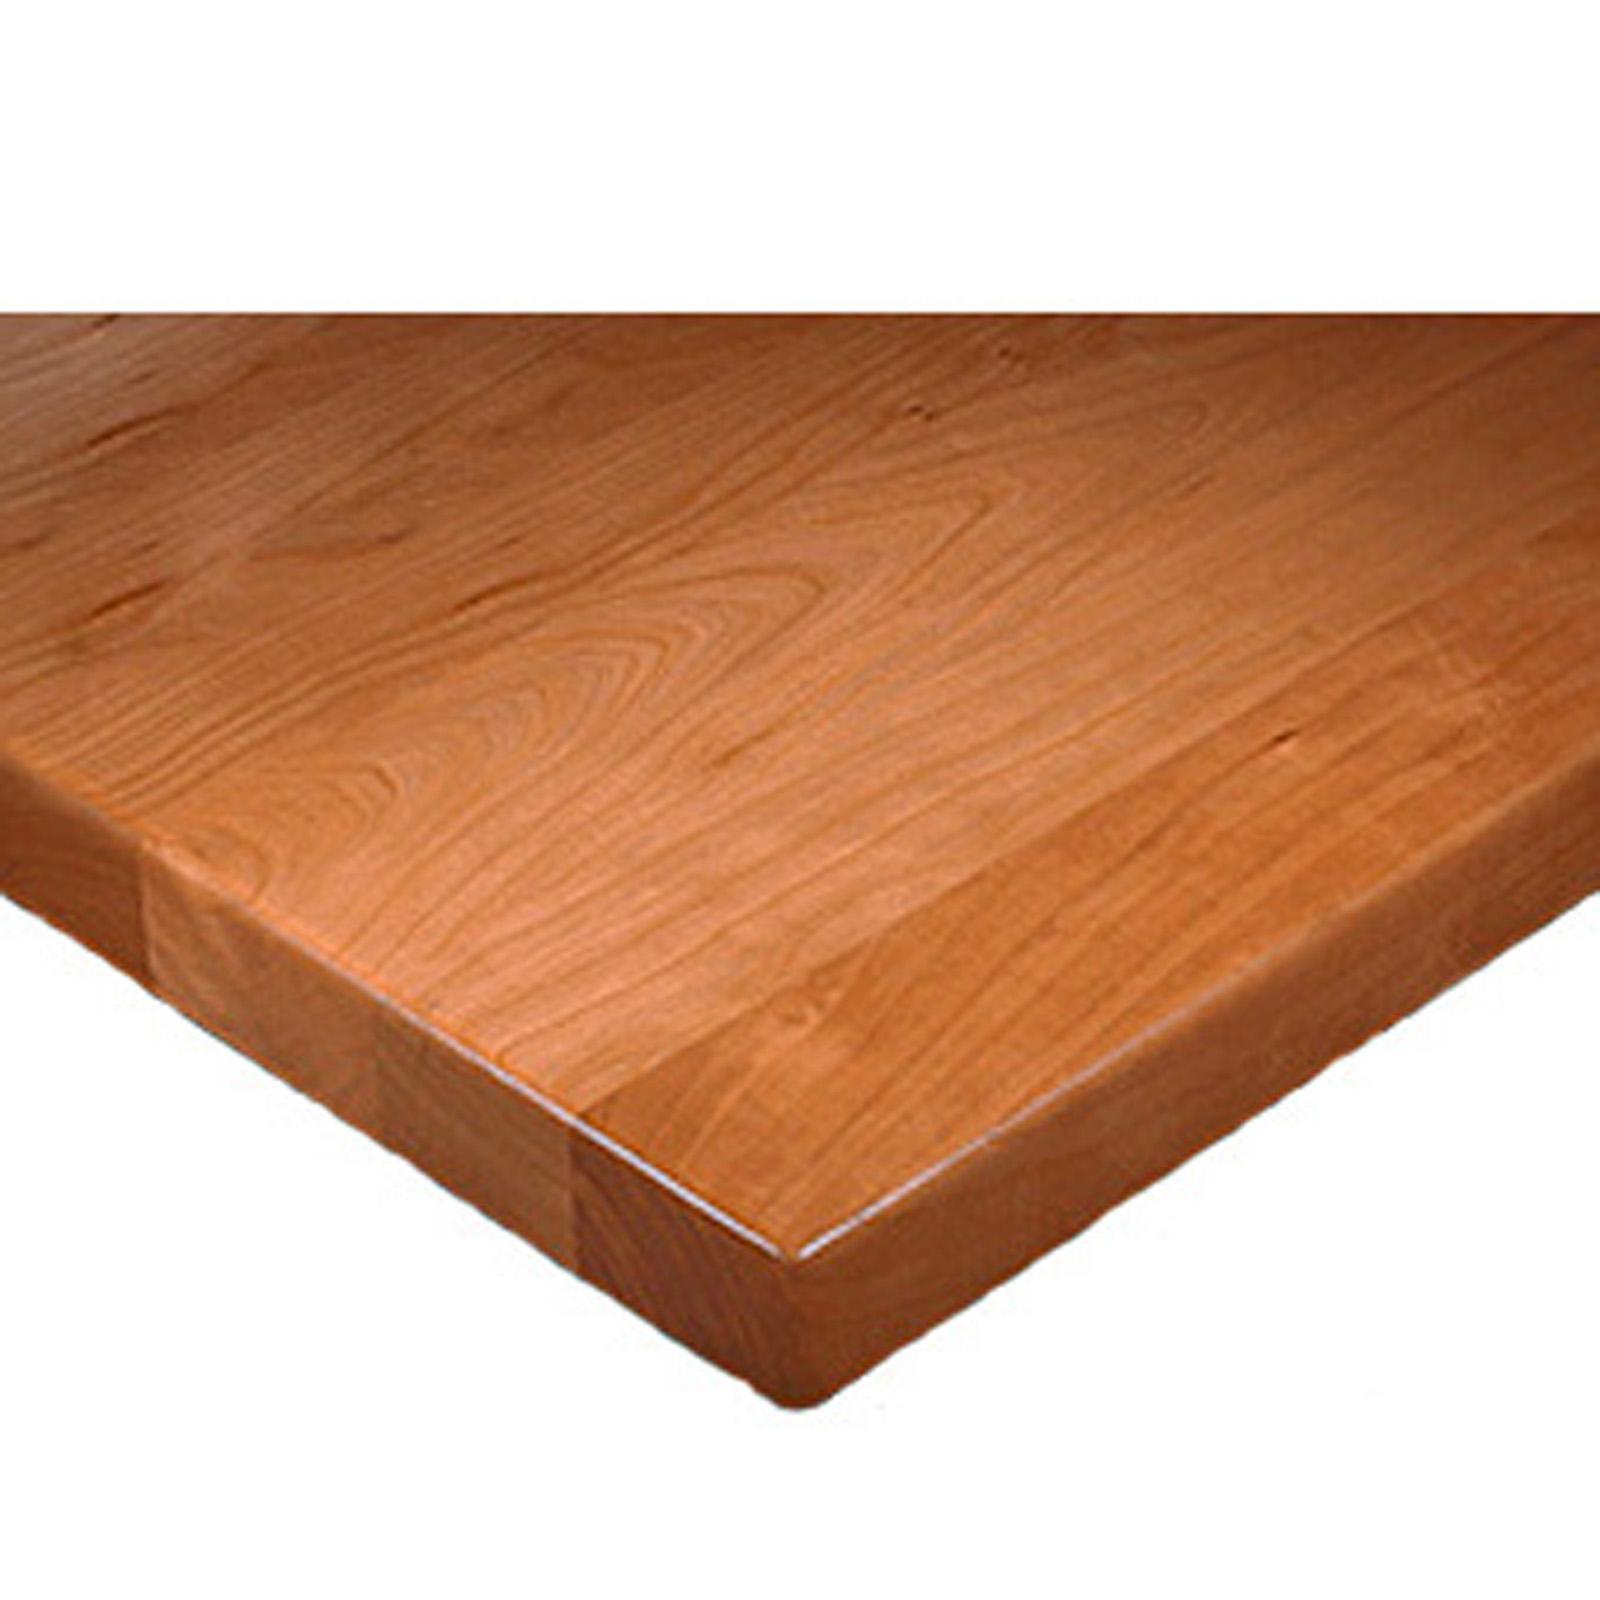 Oak Street PEO4242 table top, wood